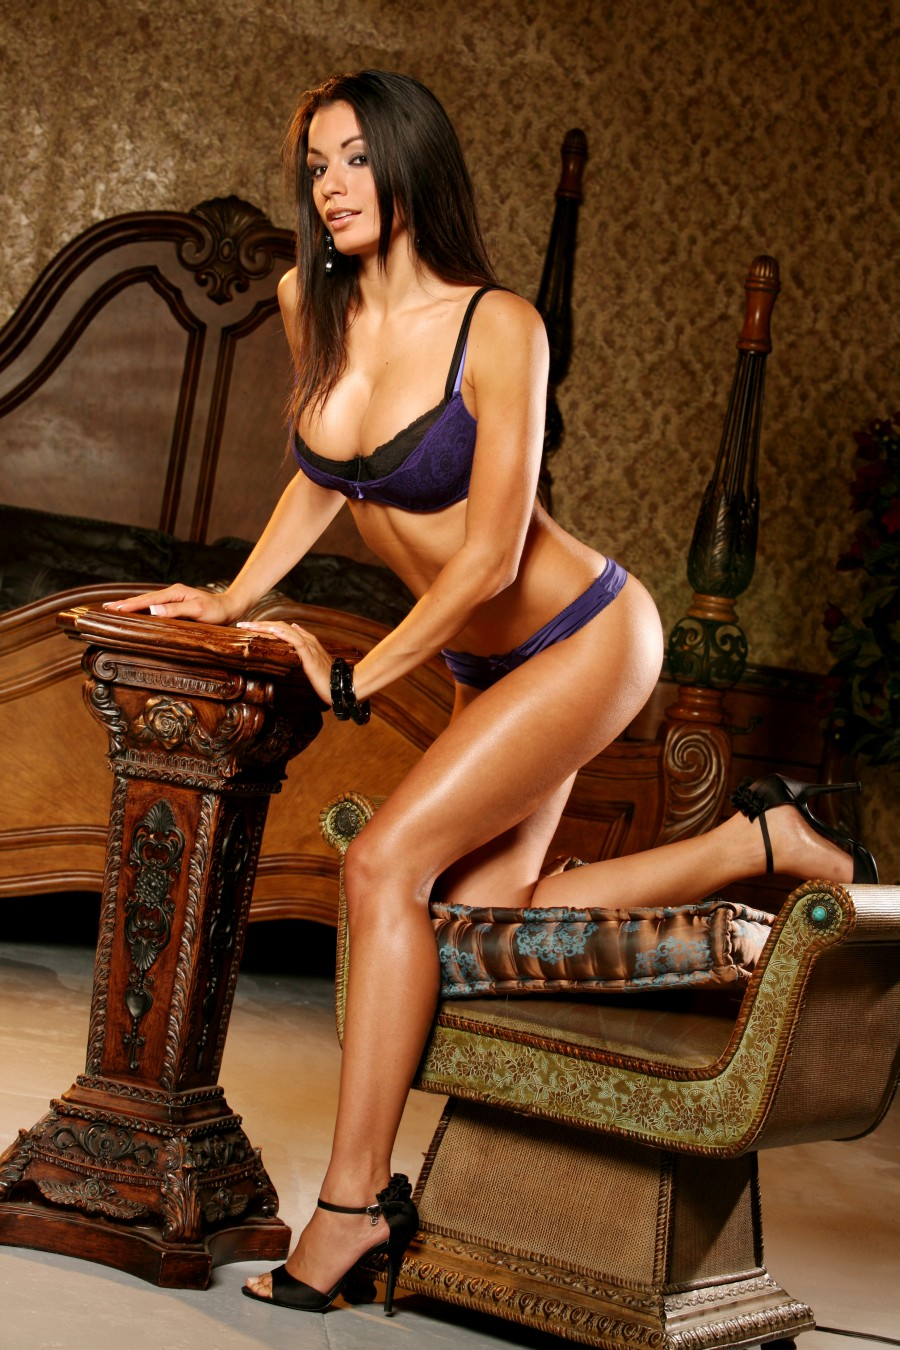 Pussy Hot Giada de Laurentiis  nudes (81 photos), Facebook, lingerie